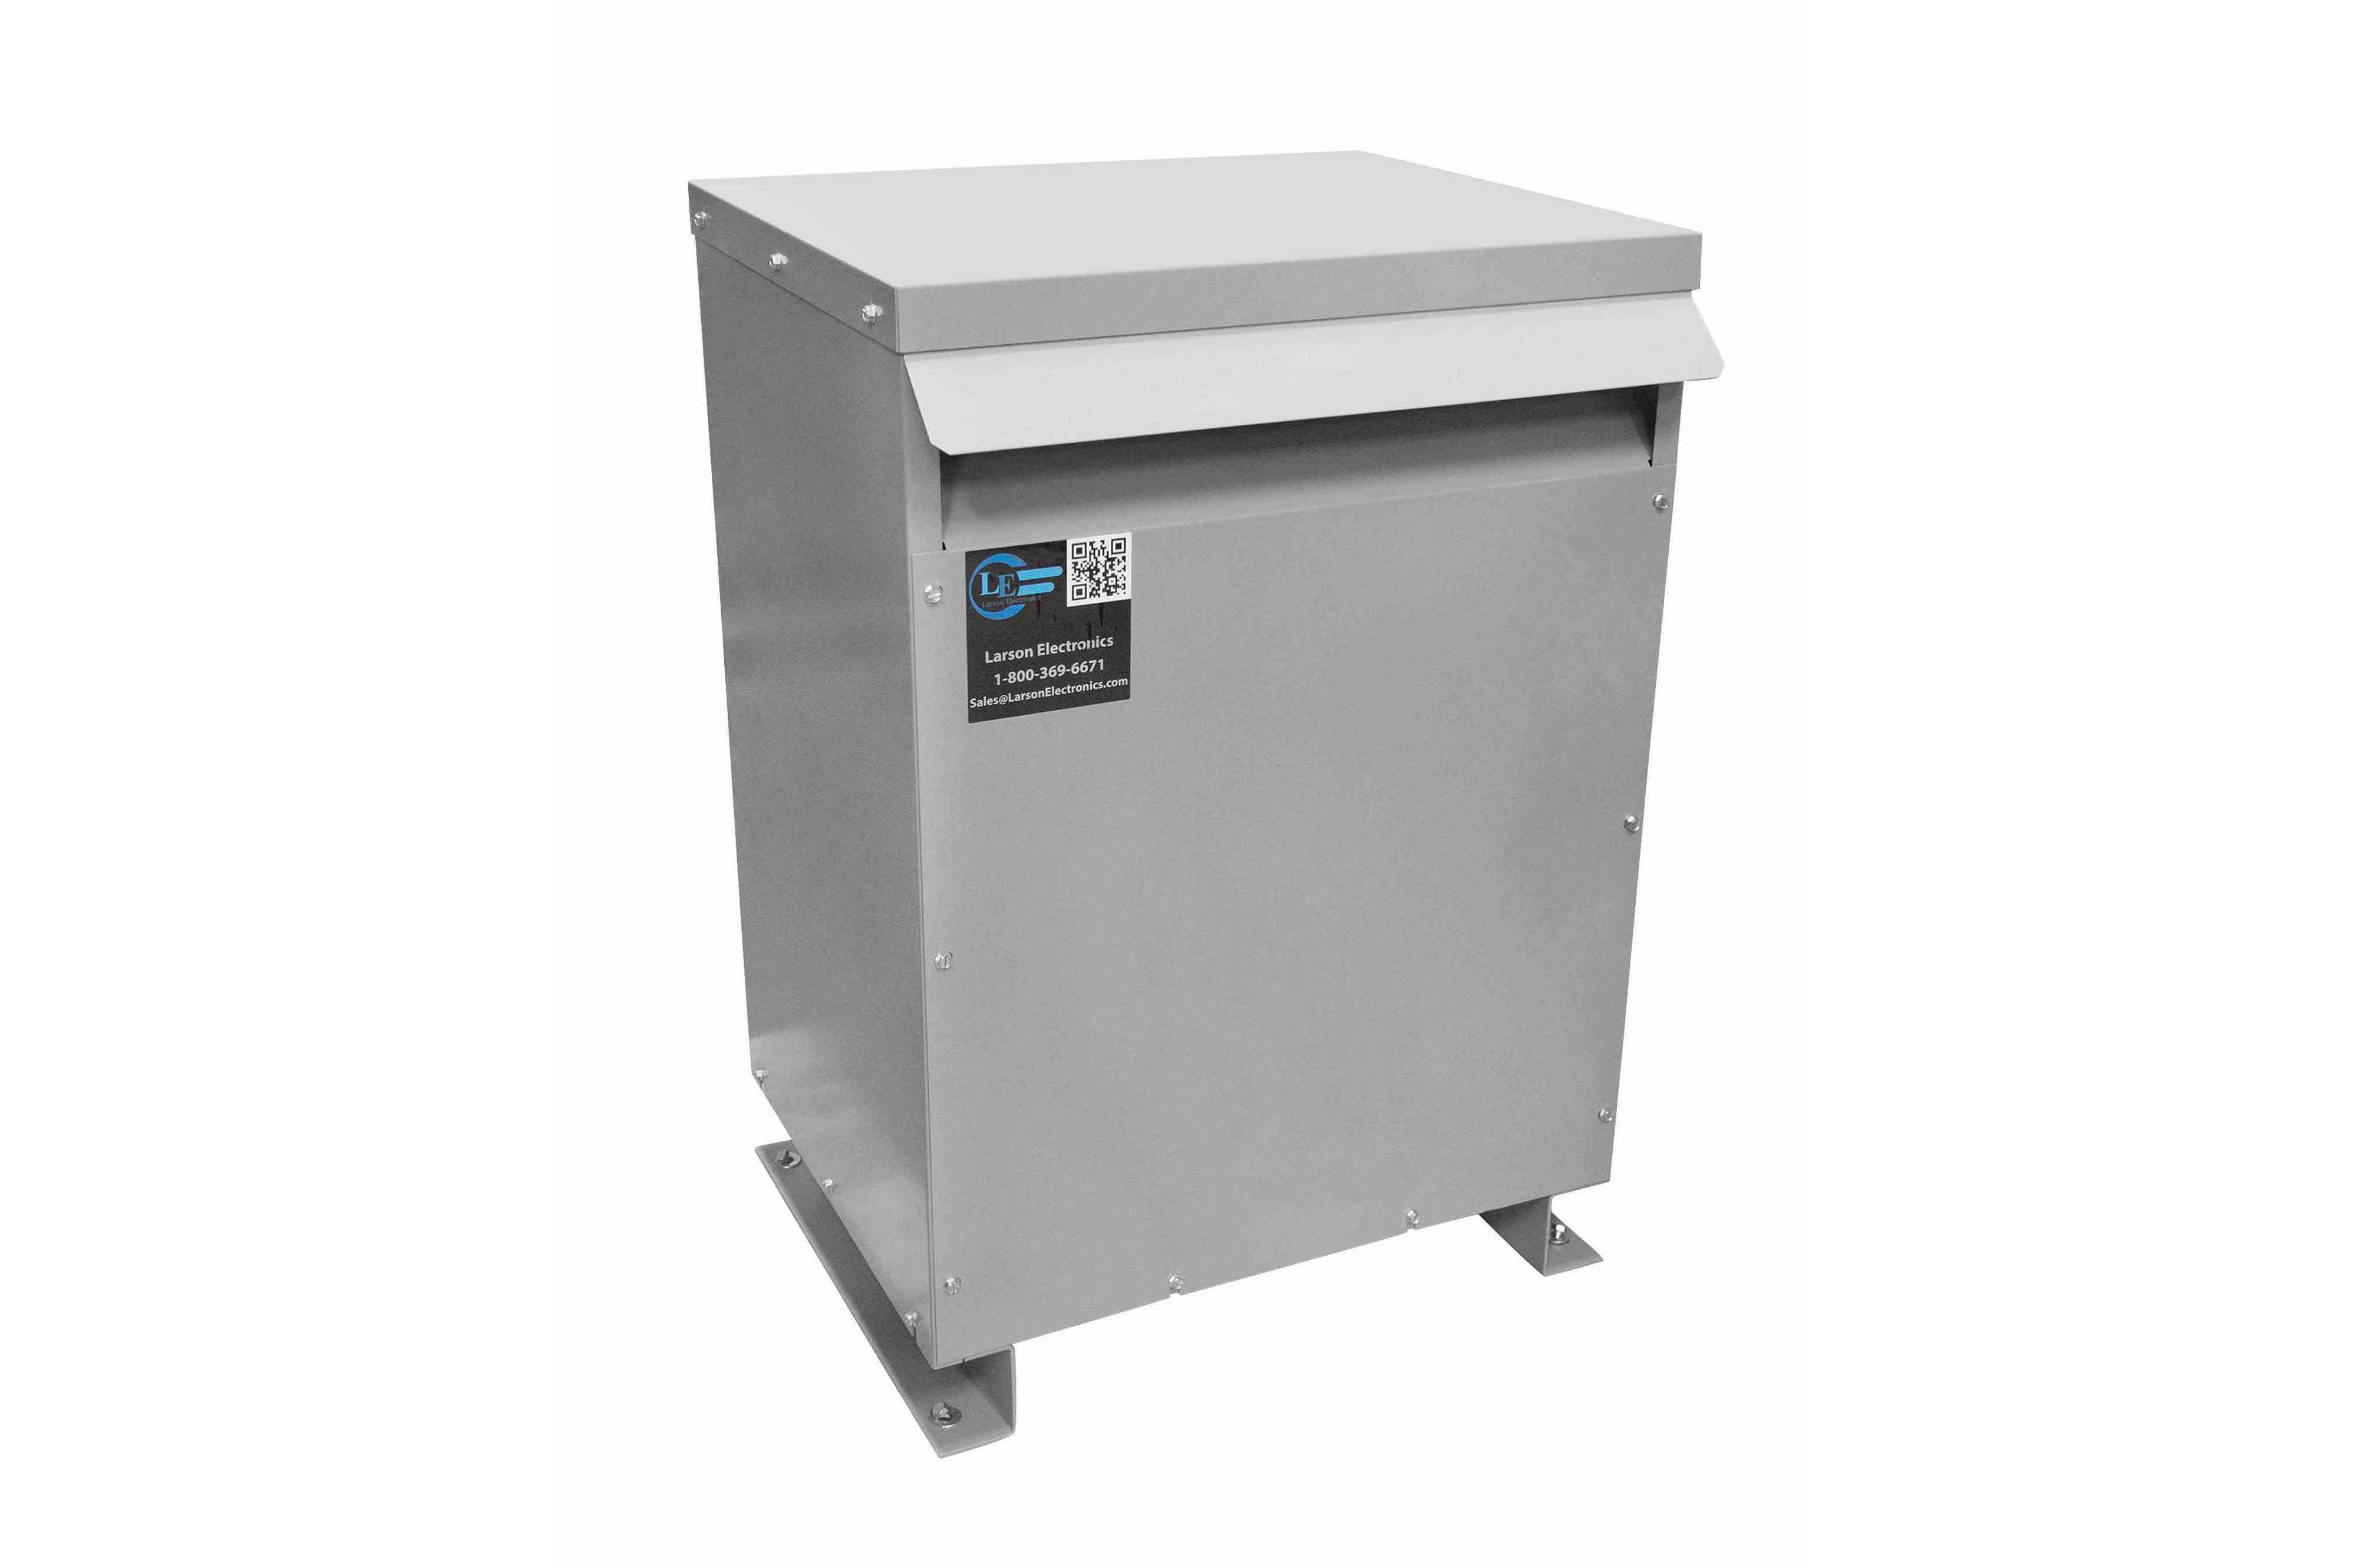 150 kVA 3PH Isolation Transformer, 400V Wye Primary, 600V Delta Secondary, N3R, Ventilated, 60 Hz